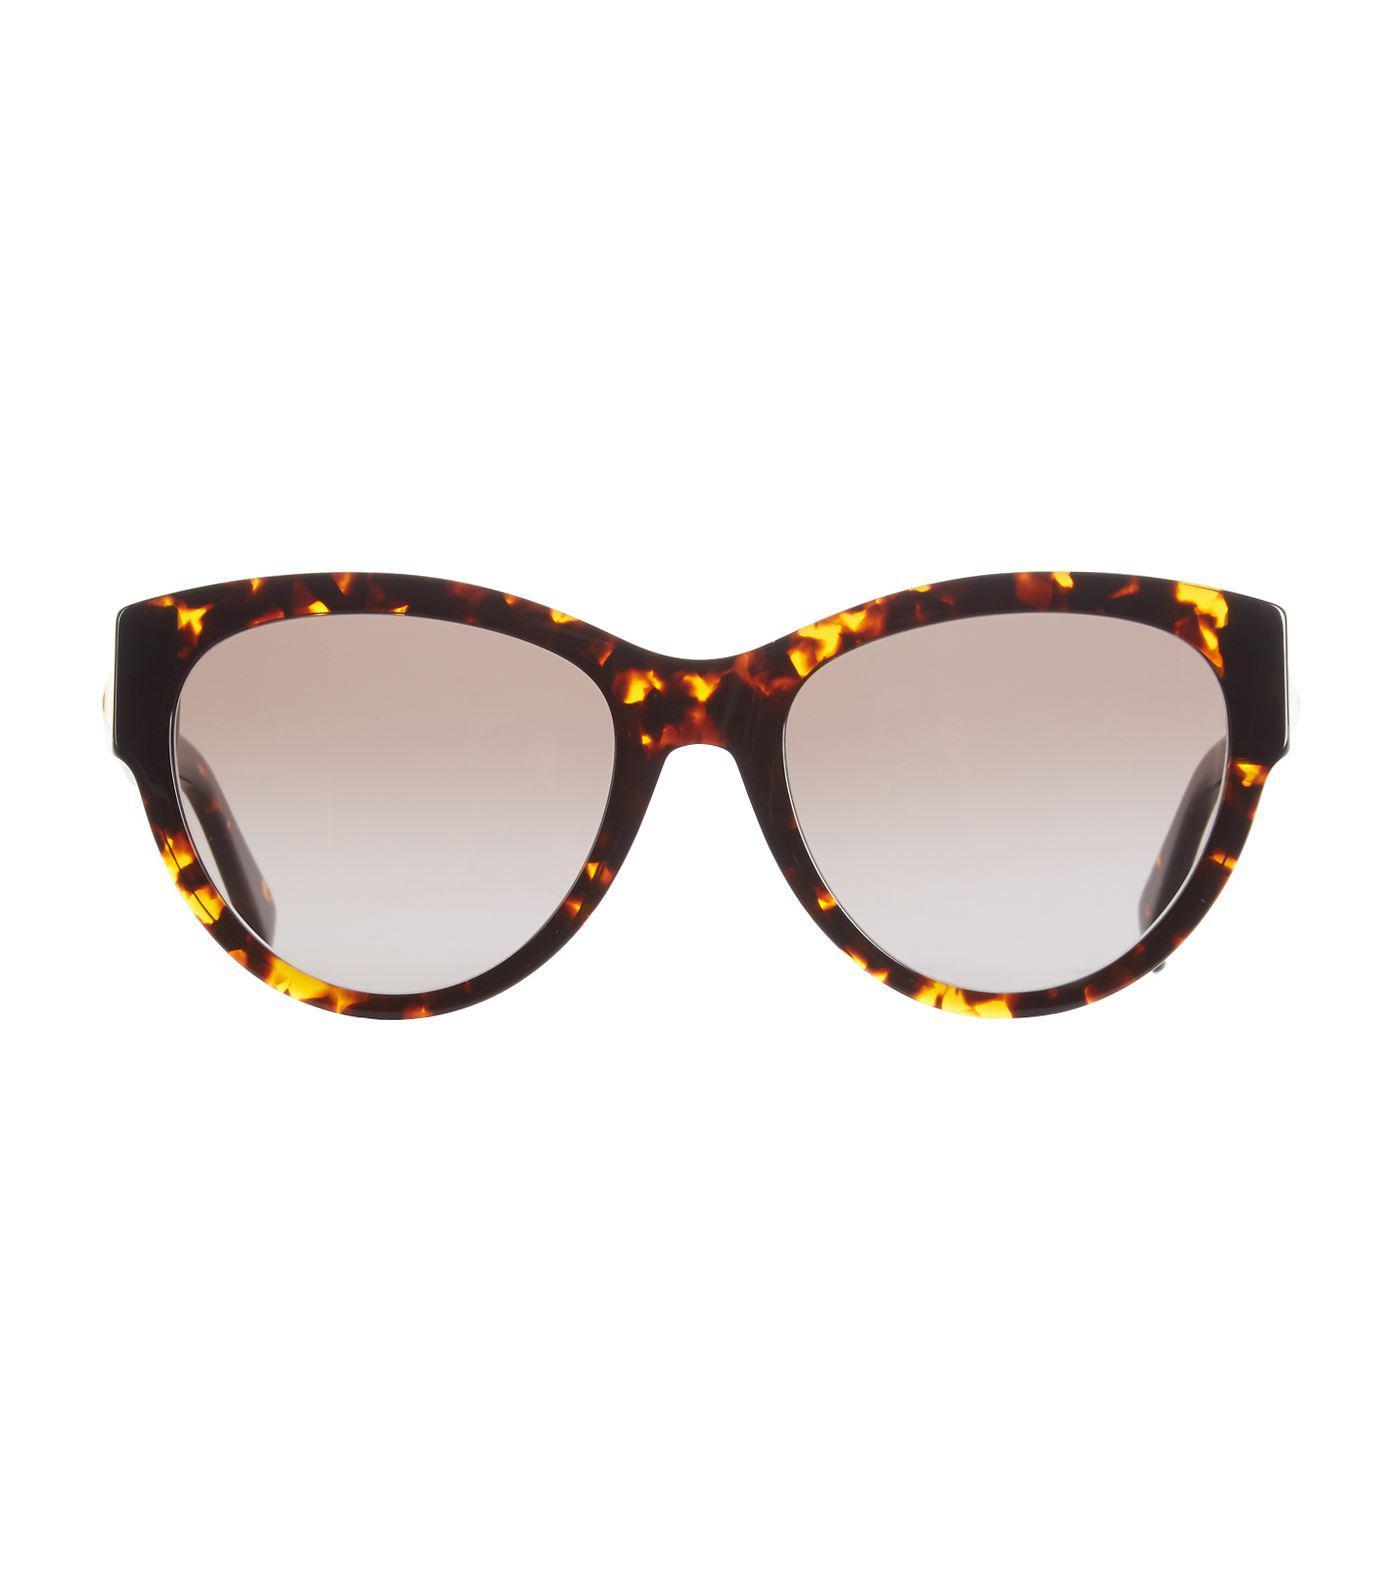 e3eba8774c8 Max Mara Flat3 Cat Eye Sunglasses in Brown - Lyst